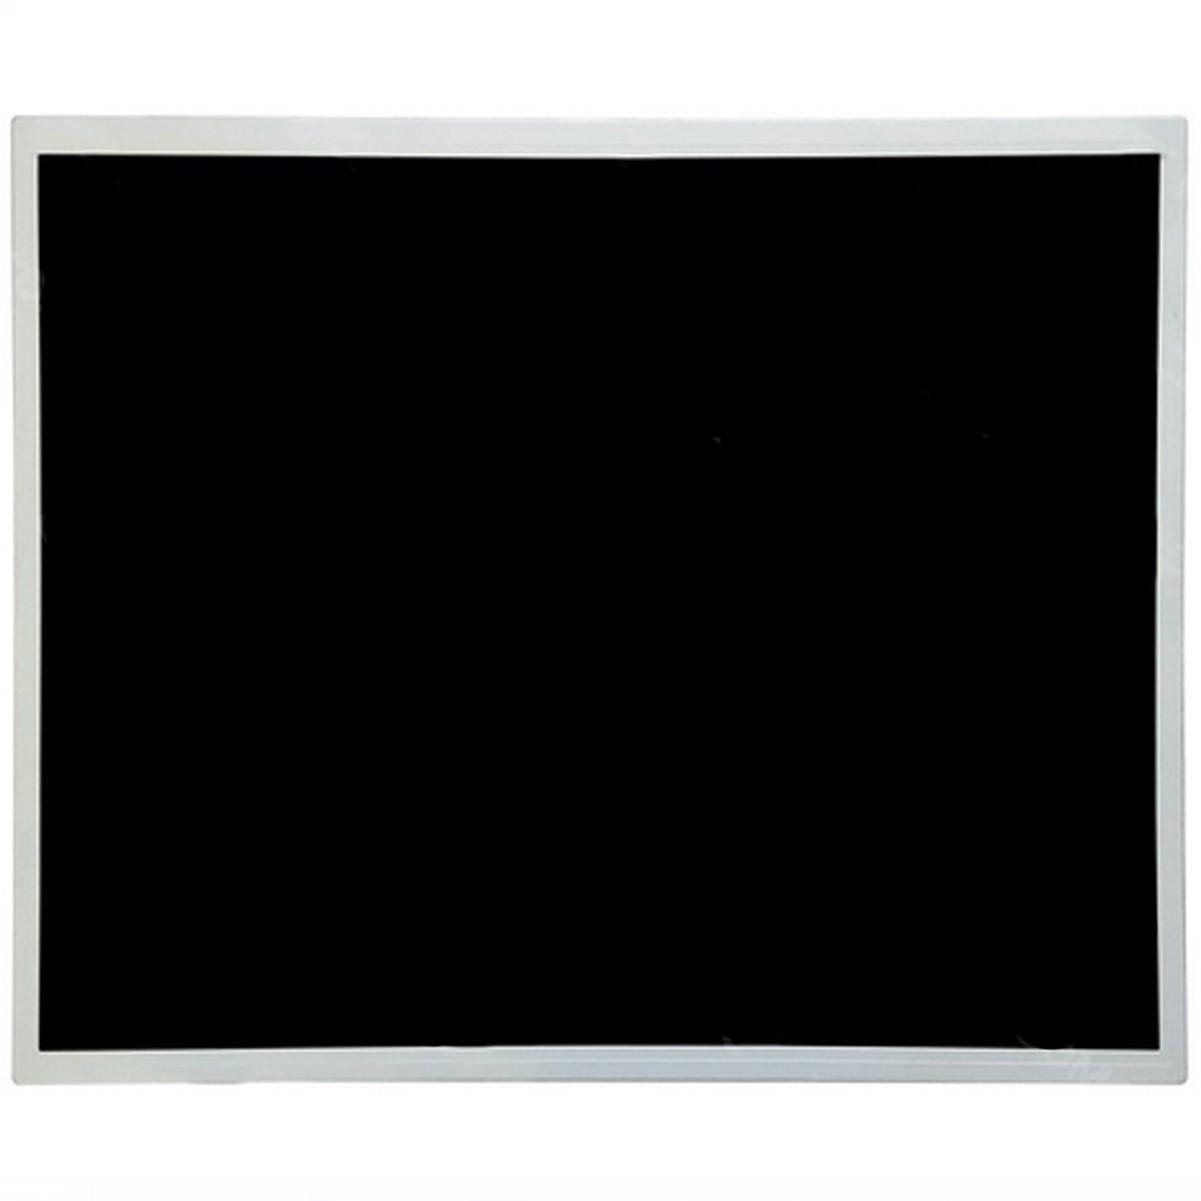 Tela Display LCD Monitor LG / DELL / AOC PN:CLAA170EA - Retirado